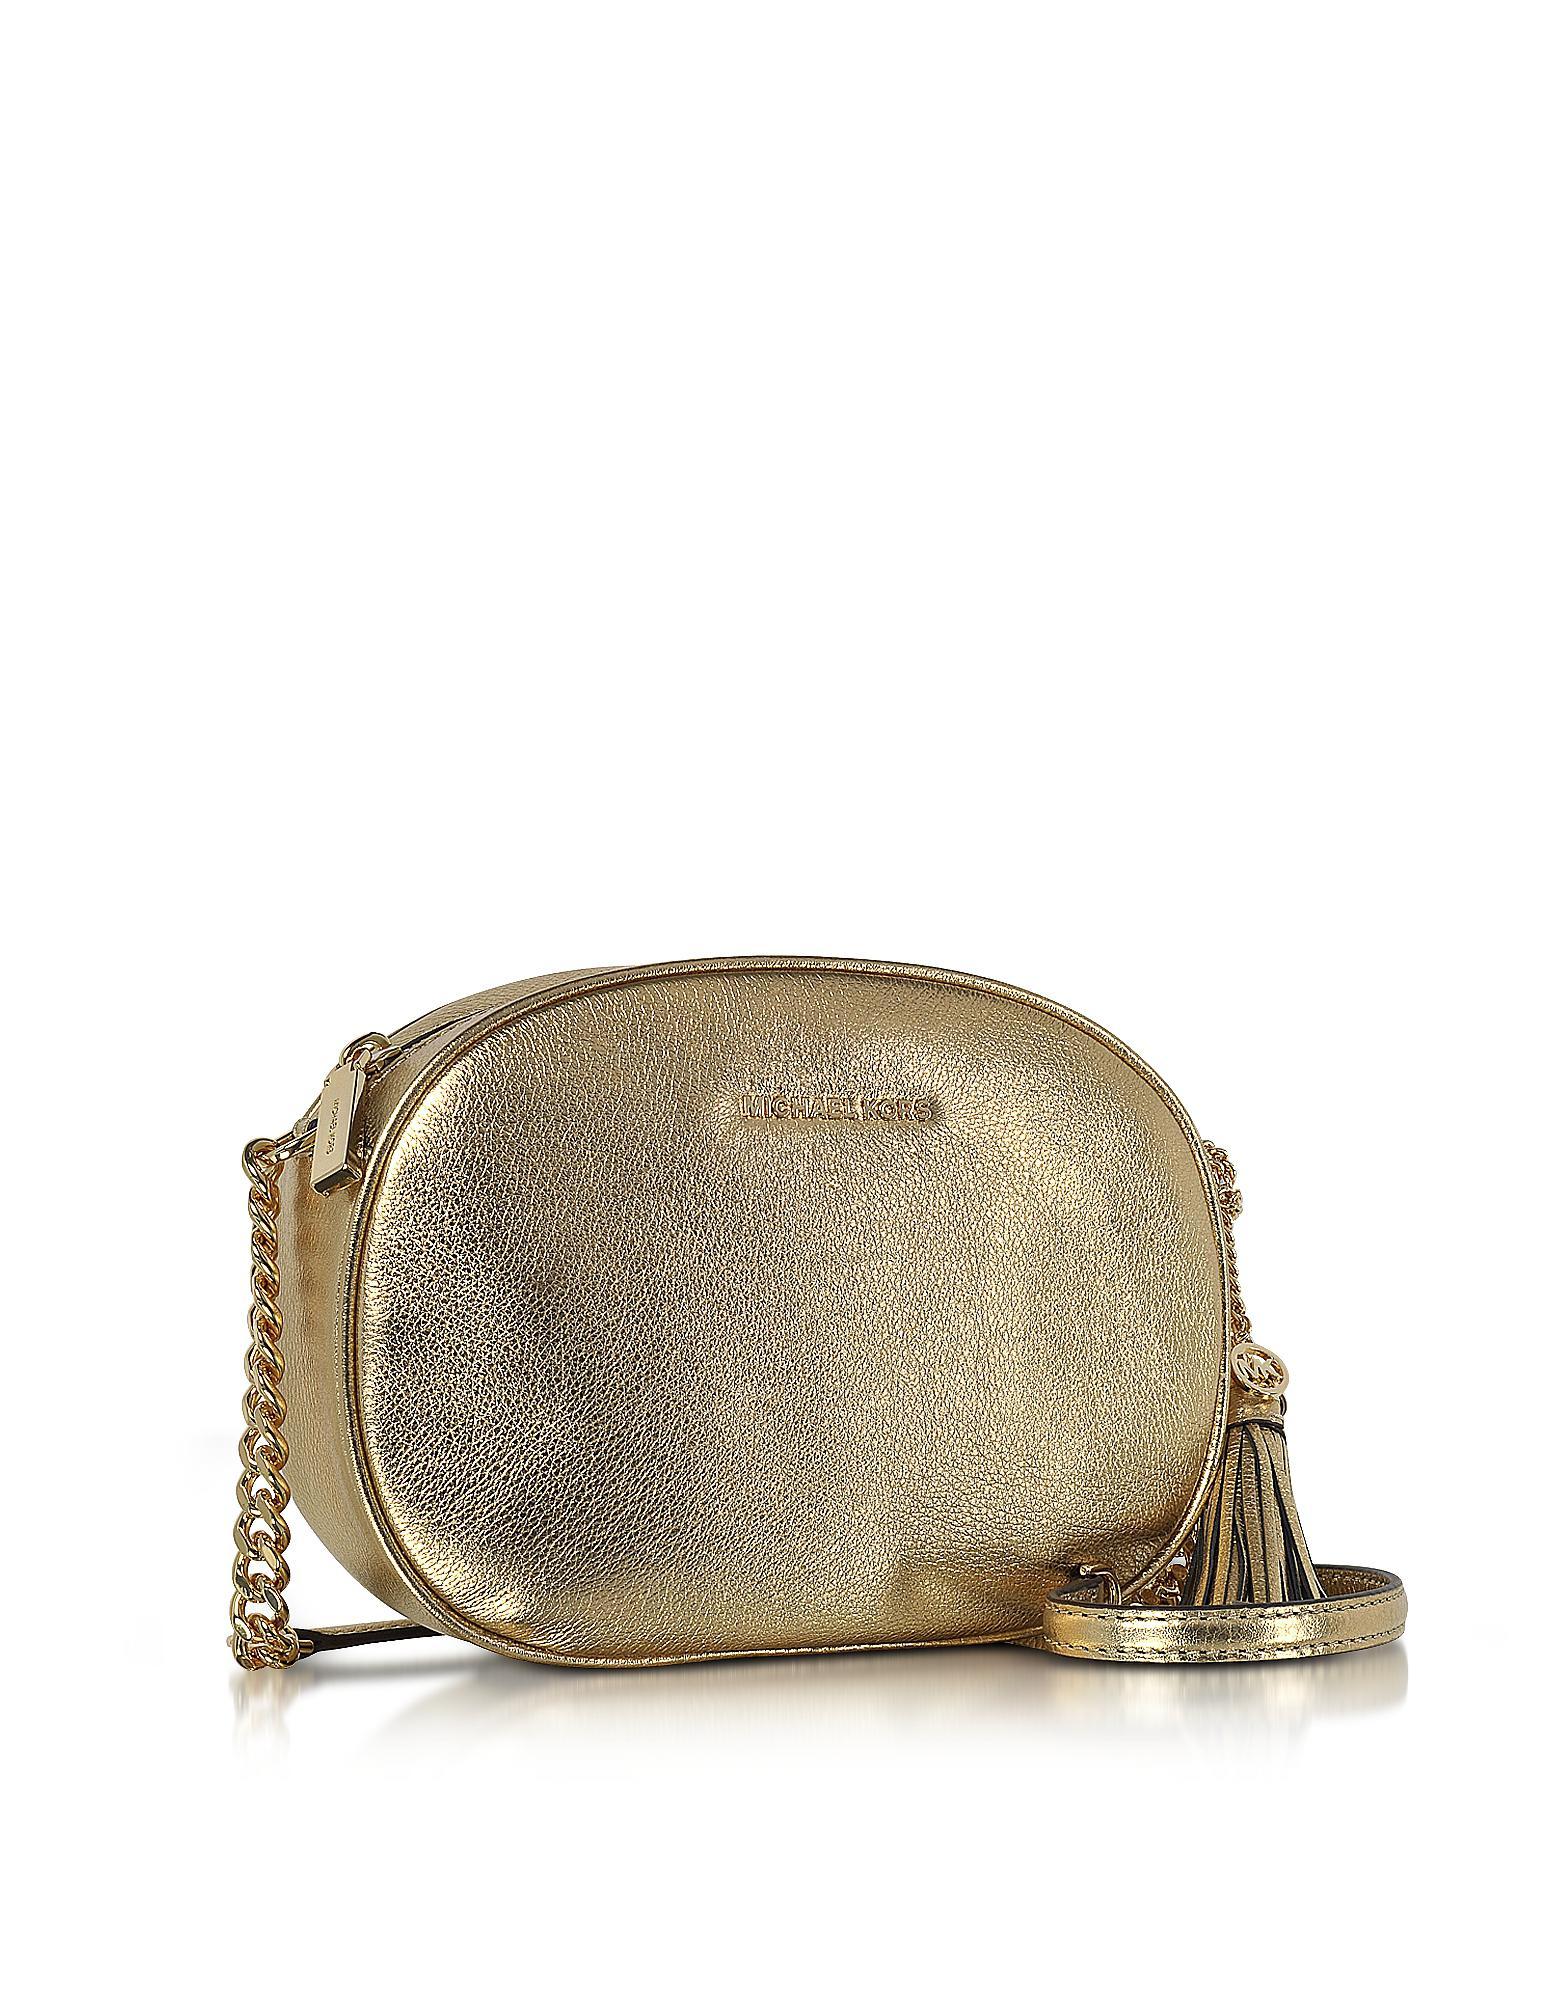 3e3afc64b32c Lyst - Michael Kors Ginny Pale Gold Pebble Leather Medium Messenger ...